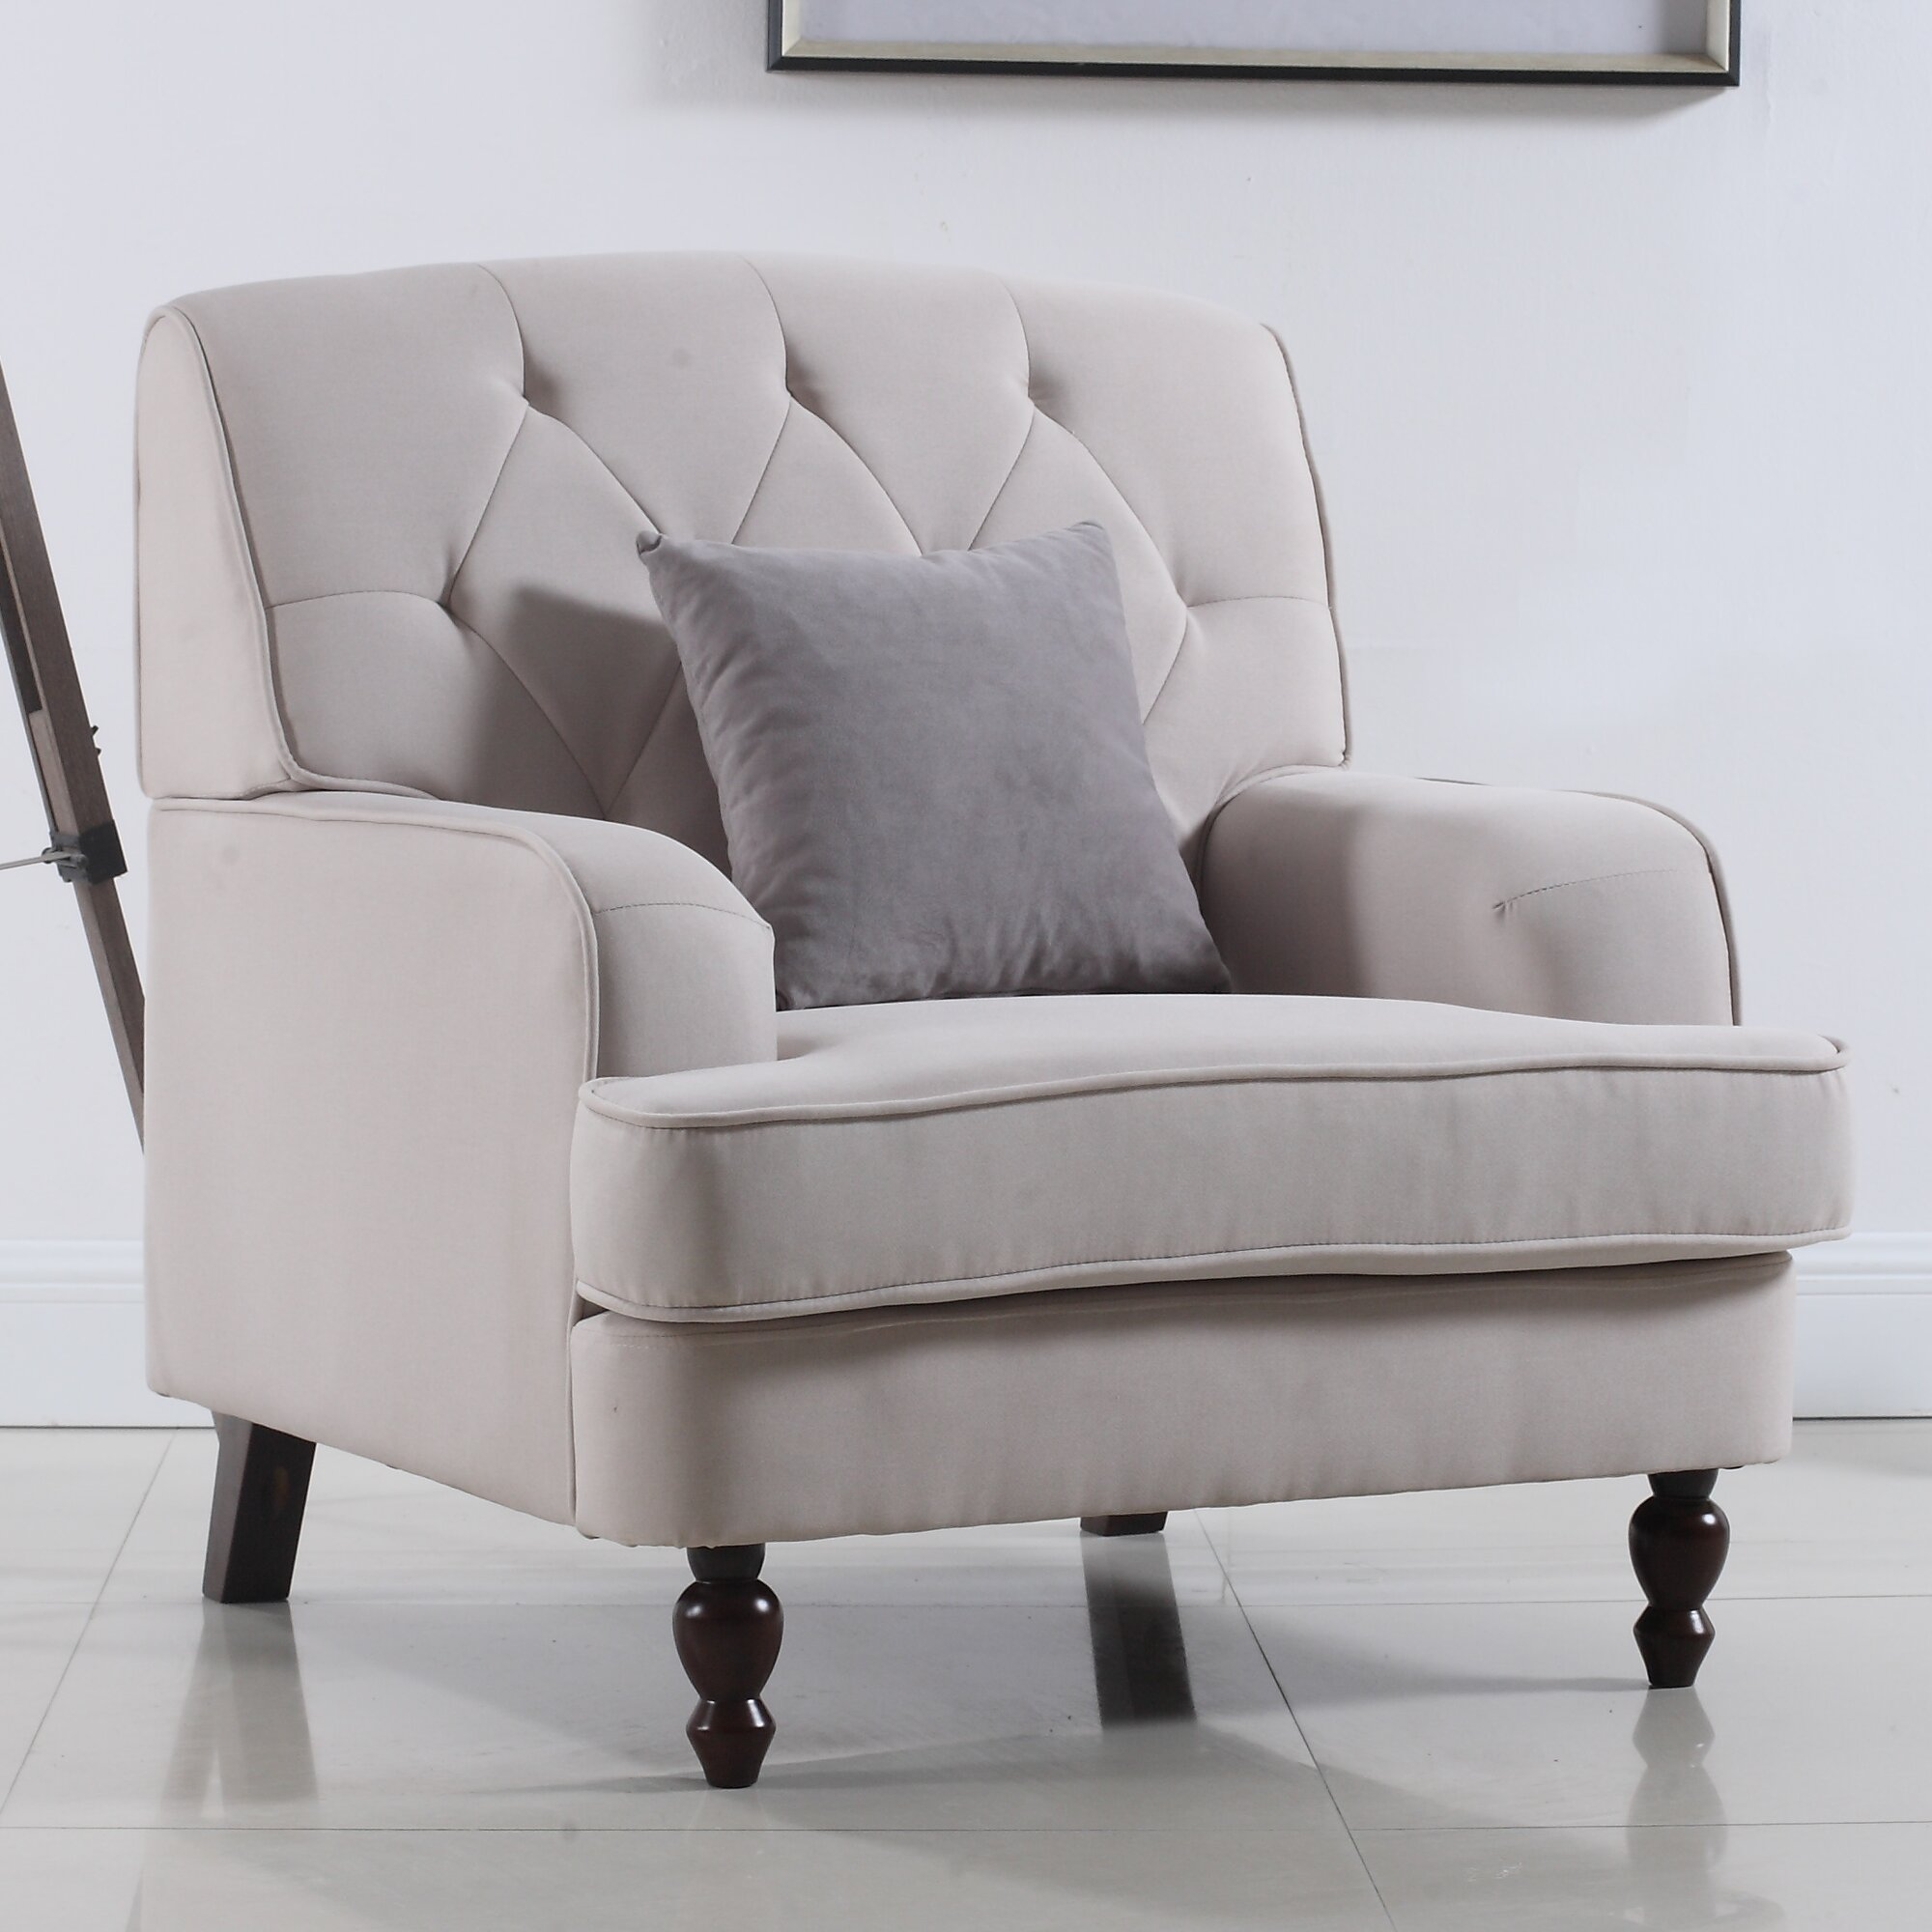 Madison Home USA Modern Tufted Fabric Living Room Arm Chair